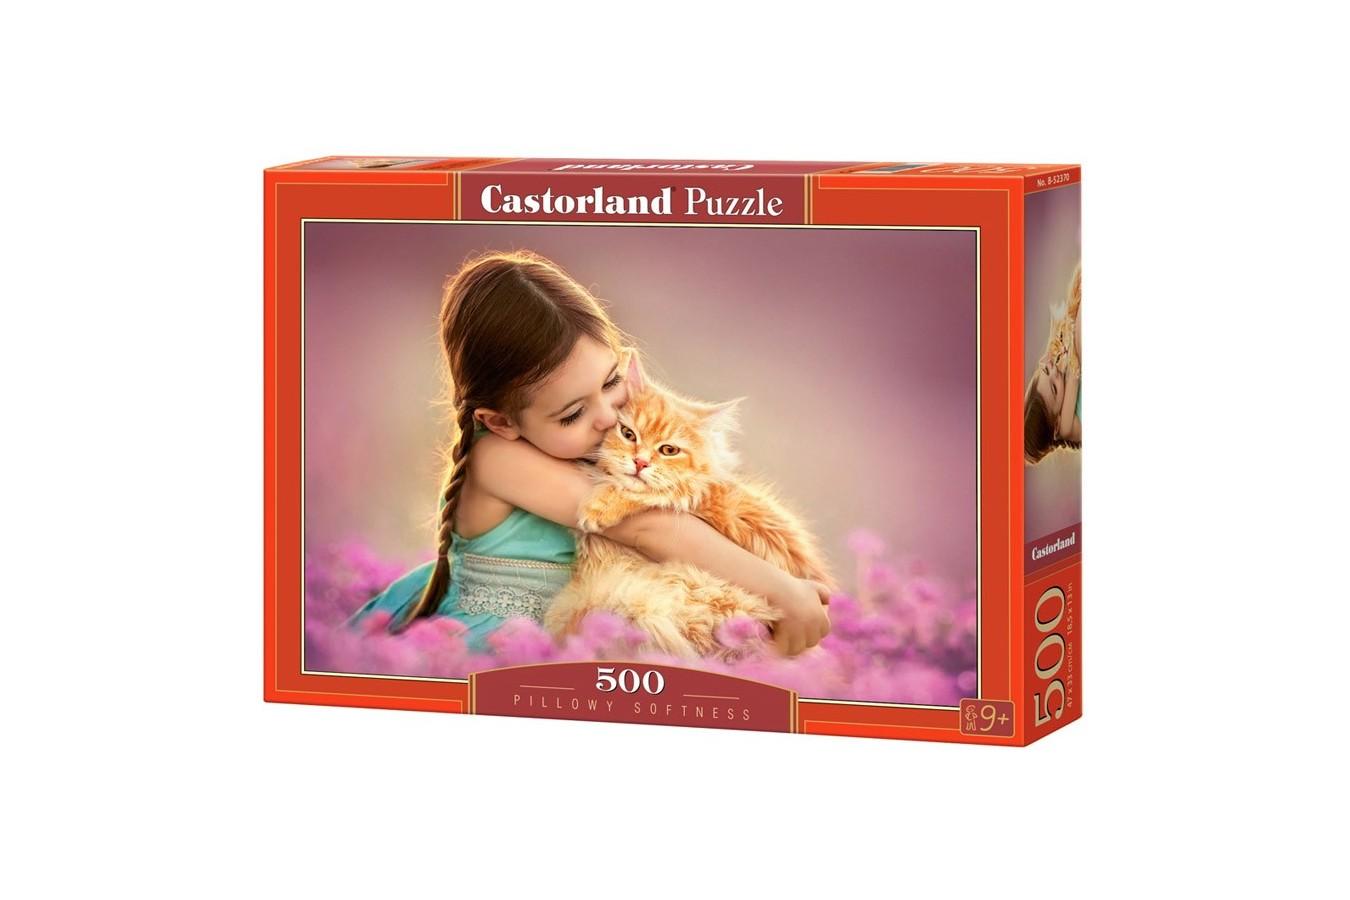 Puzzle Castorland - Pillowy Softness, 500 piese